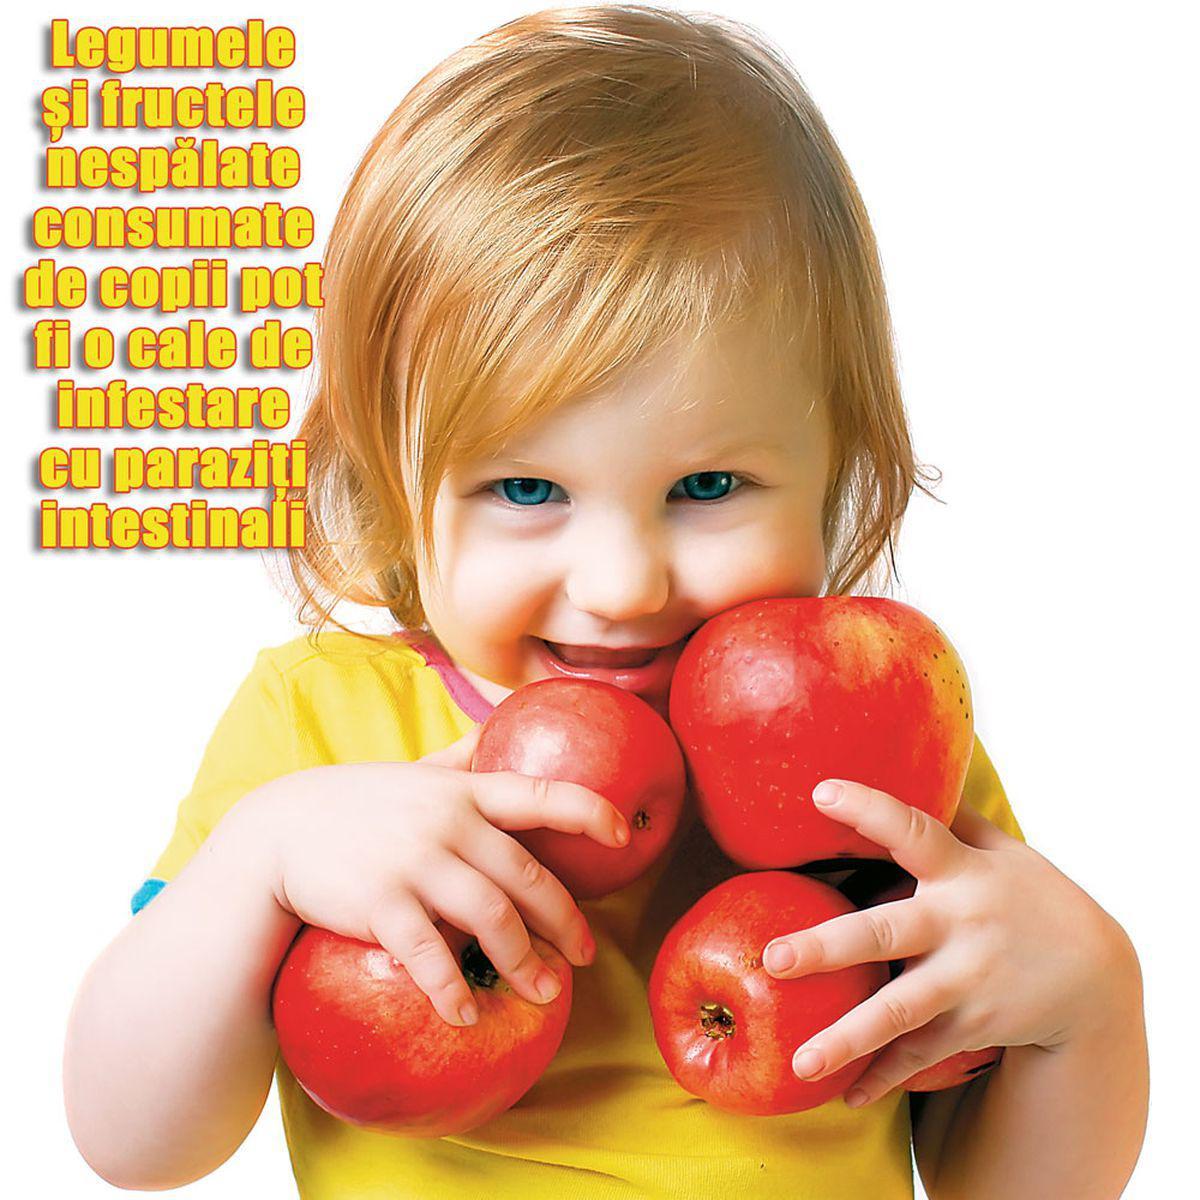 viermi la viermi pentru copii vierme medicament pentru copii suspensie